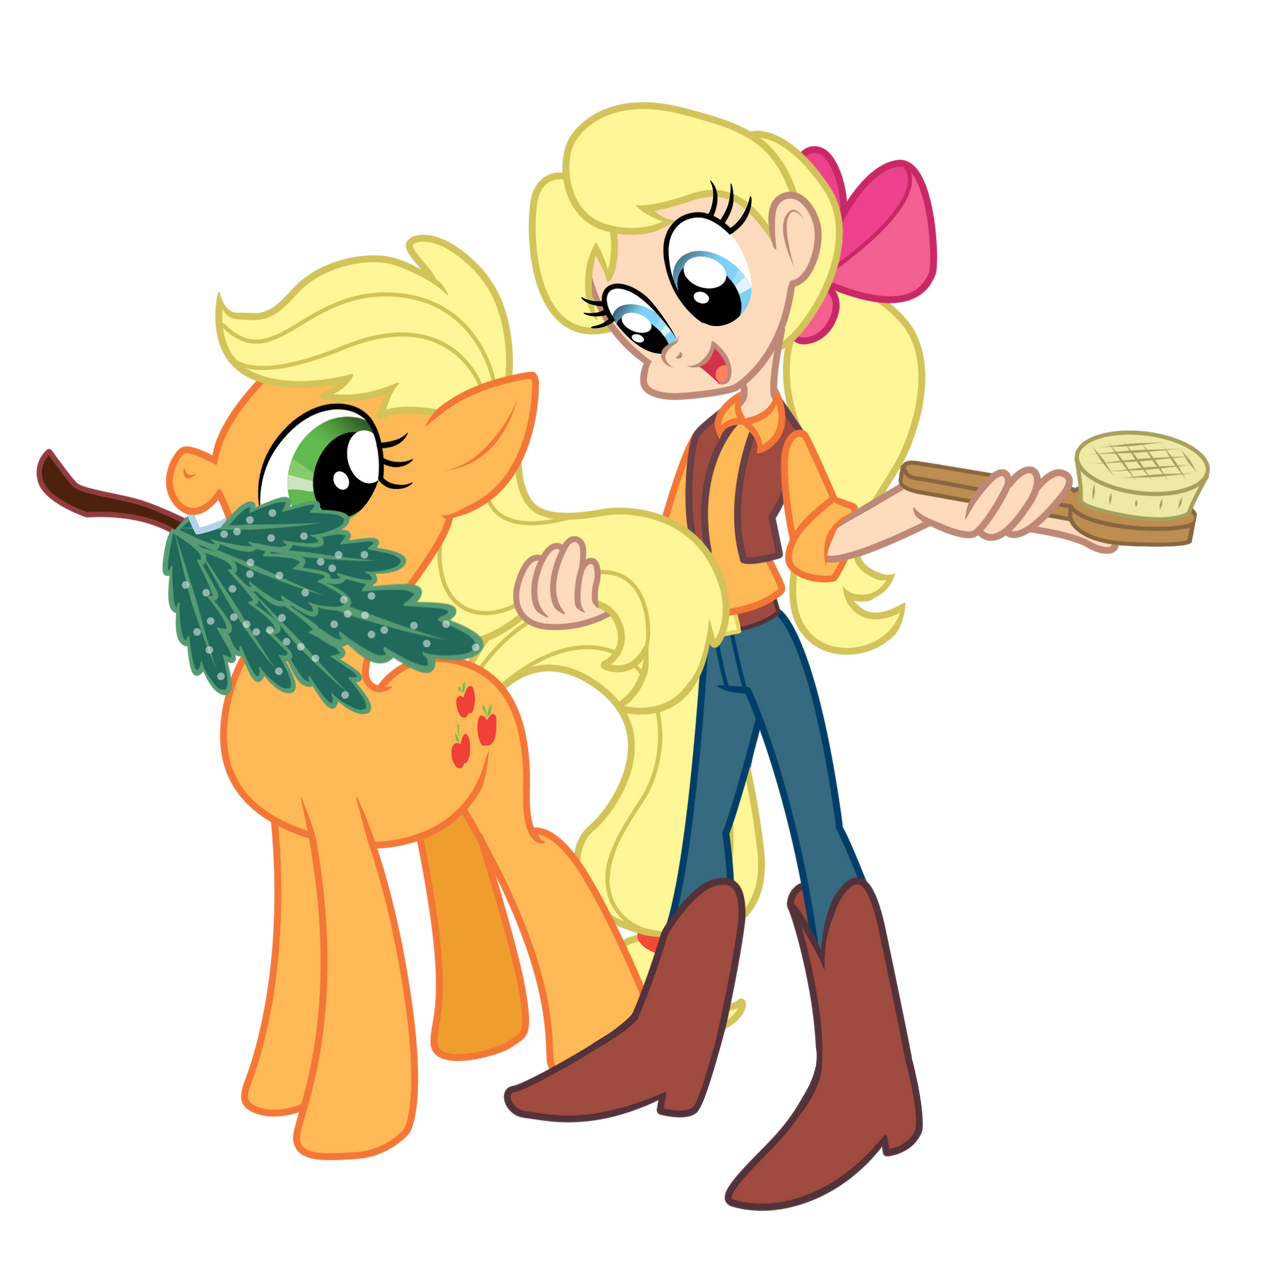 [Obrázek: my_little_pony___applejack_and_megan_by_...5nnd8x.png]